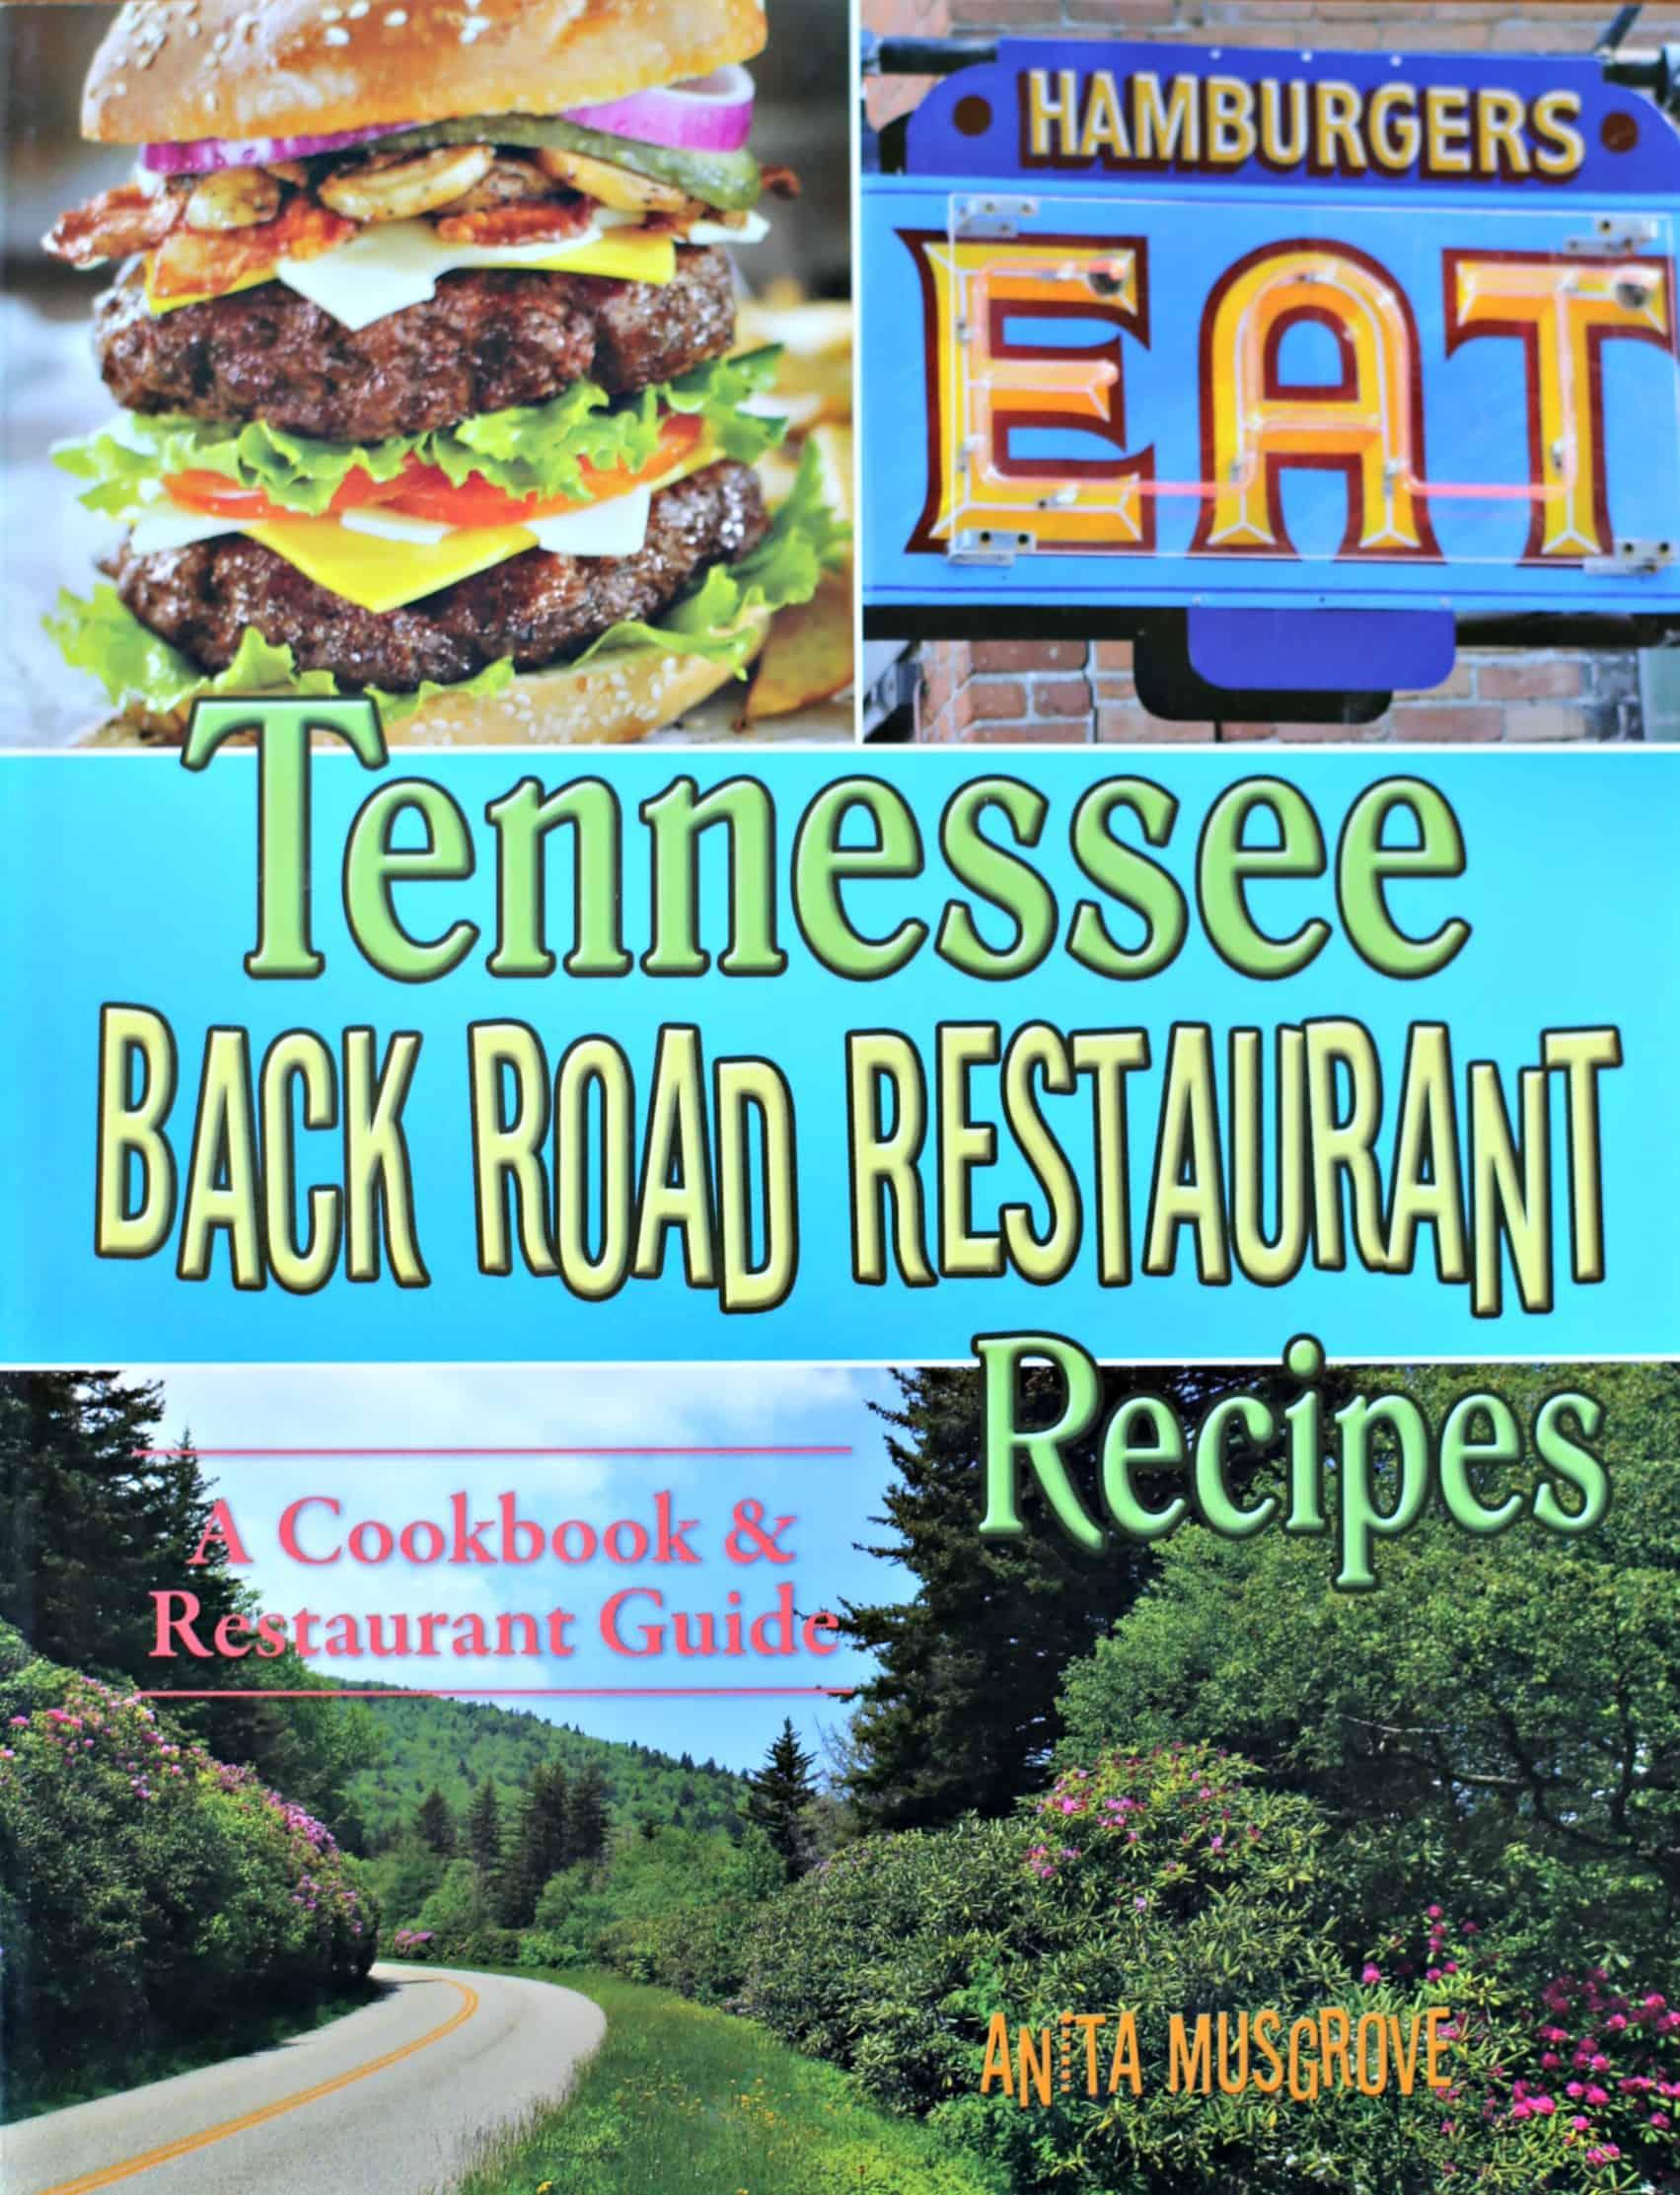 Tennessee Back Road Restaurant Recipes cookbook